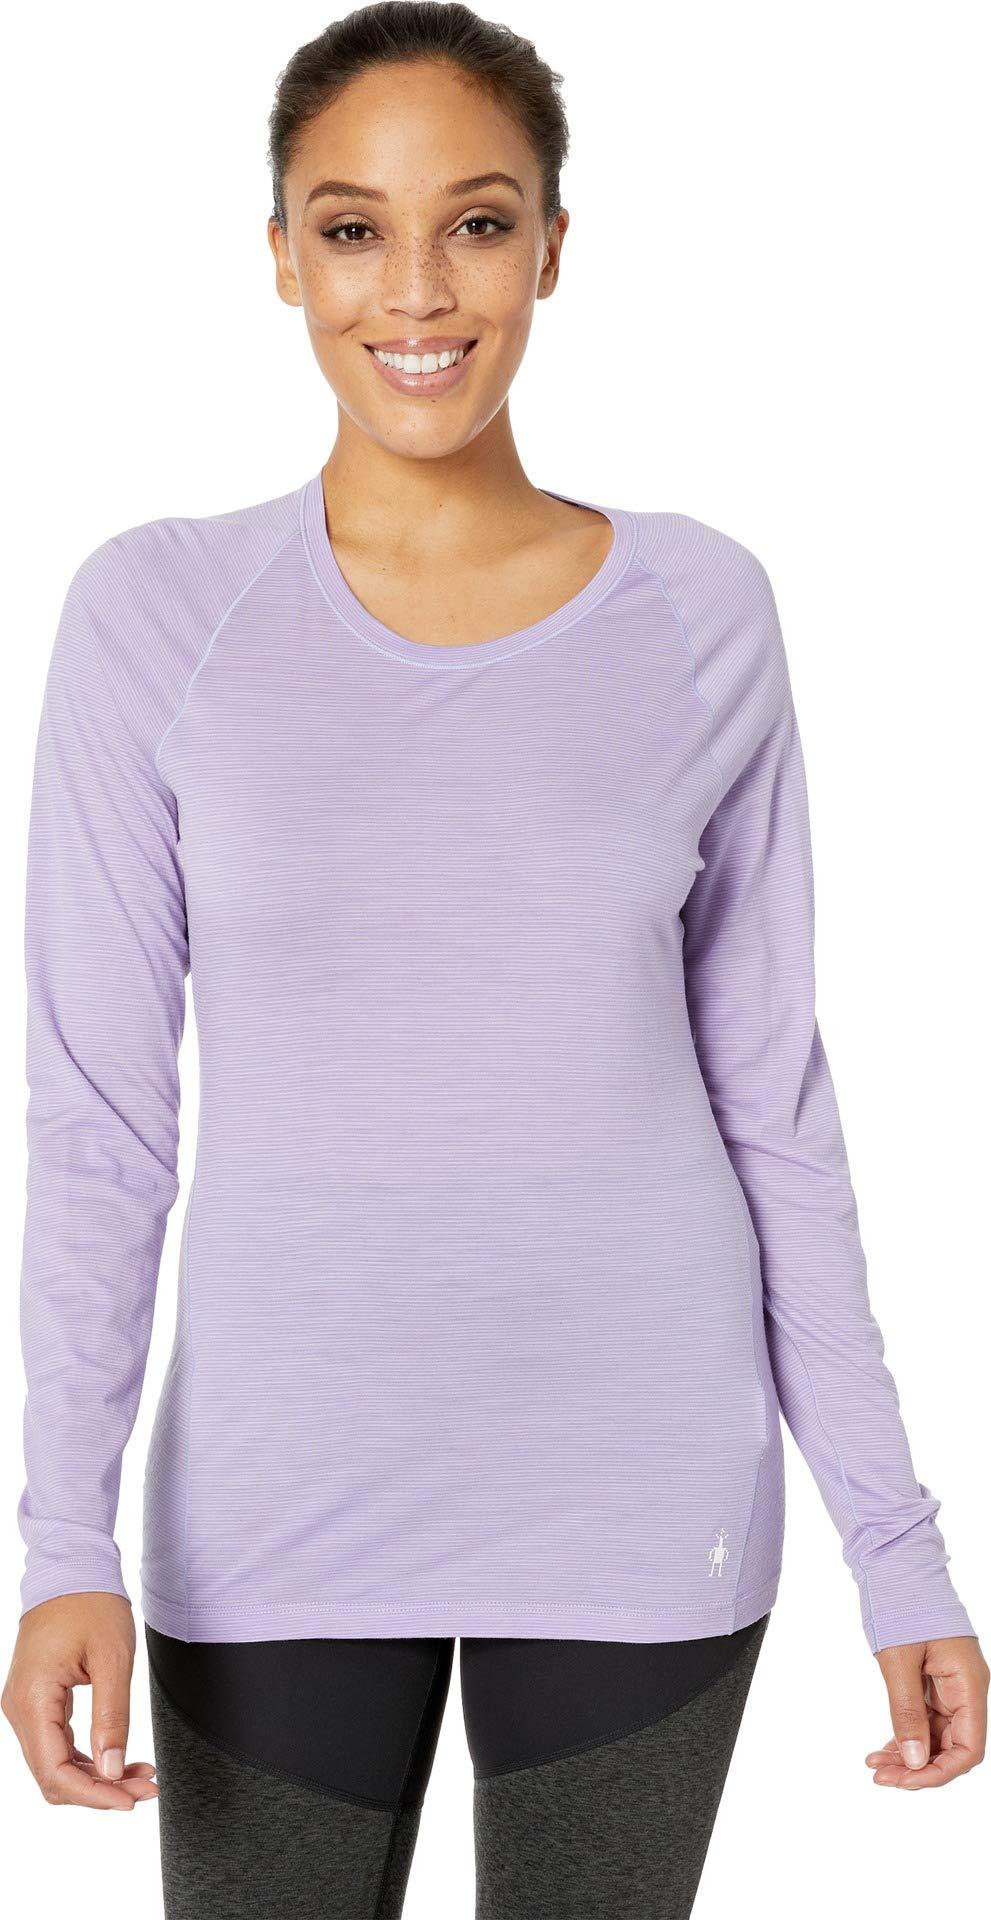 SmartWool Women's Merino 150 Baselayer Pattern Long Sleeve Cascade Purple X-Small